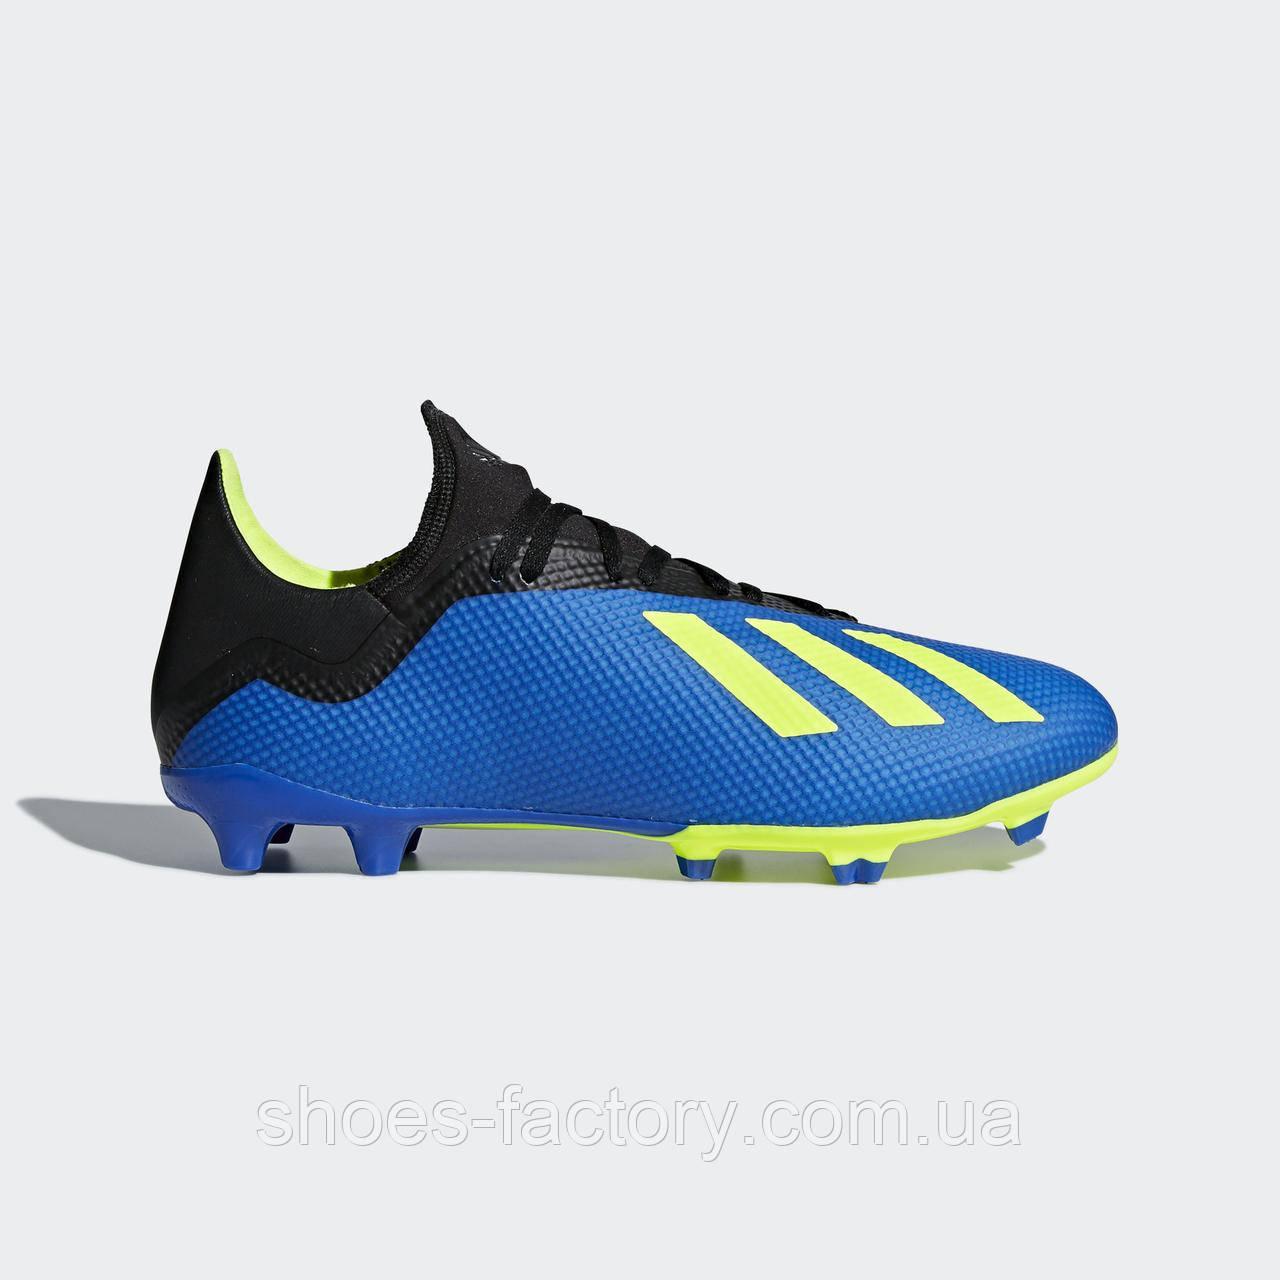 Бутсы Adidas X 18.3 Firm Ground Cleats, DA9335 (Оригинал)